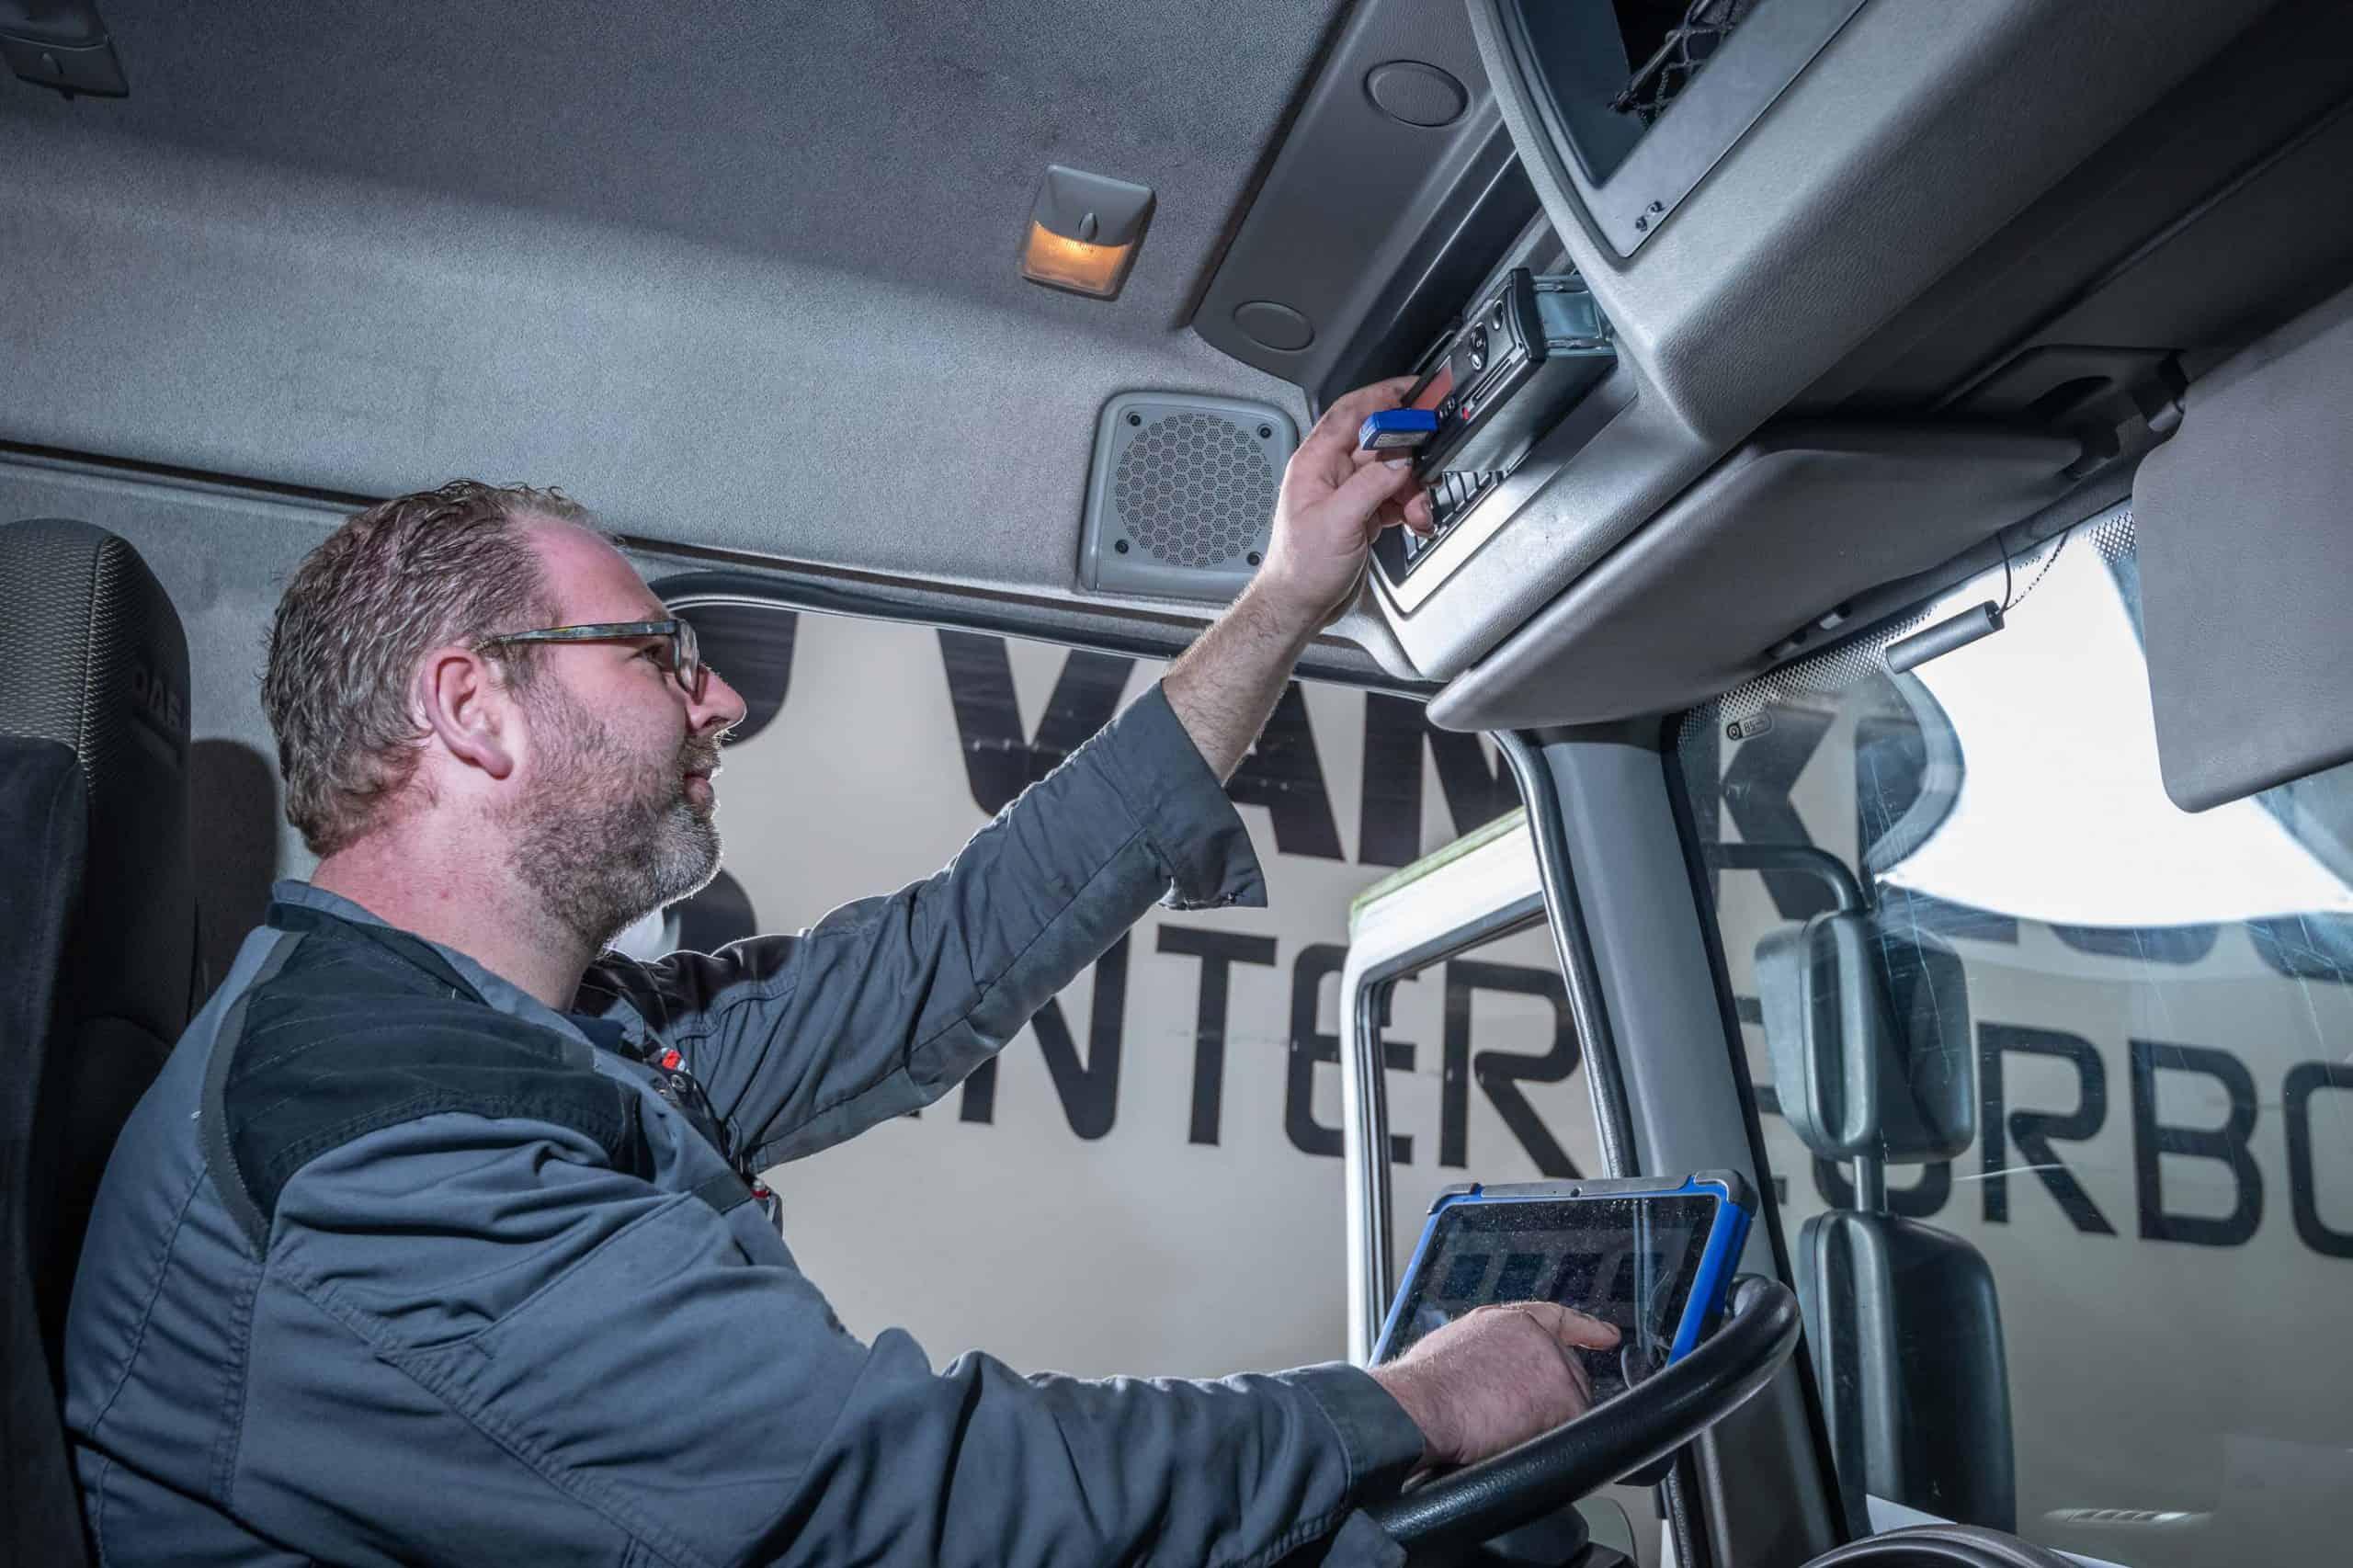 tachograaf service medewerker teunis